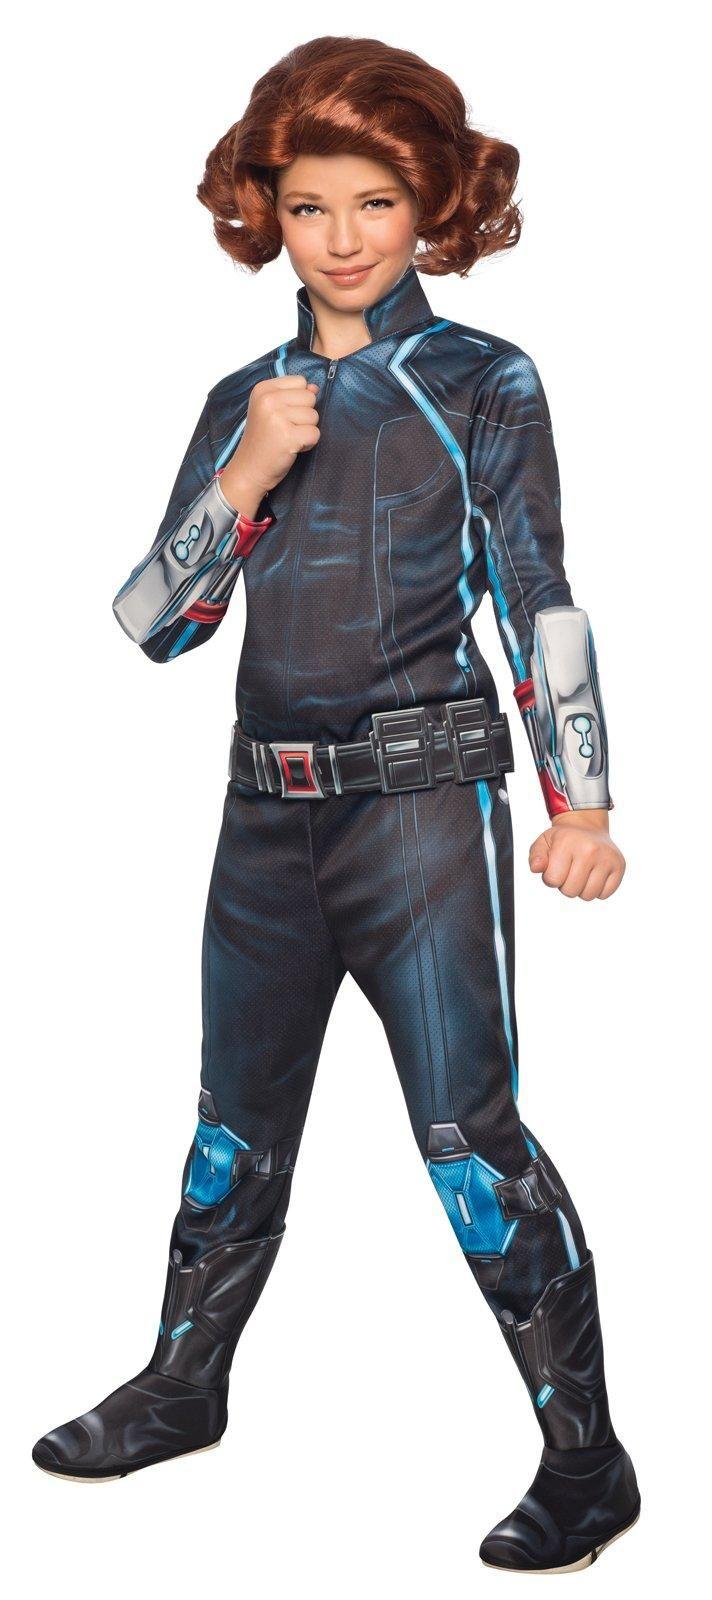 27 best Avengers Costumes images on Pinterest